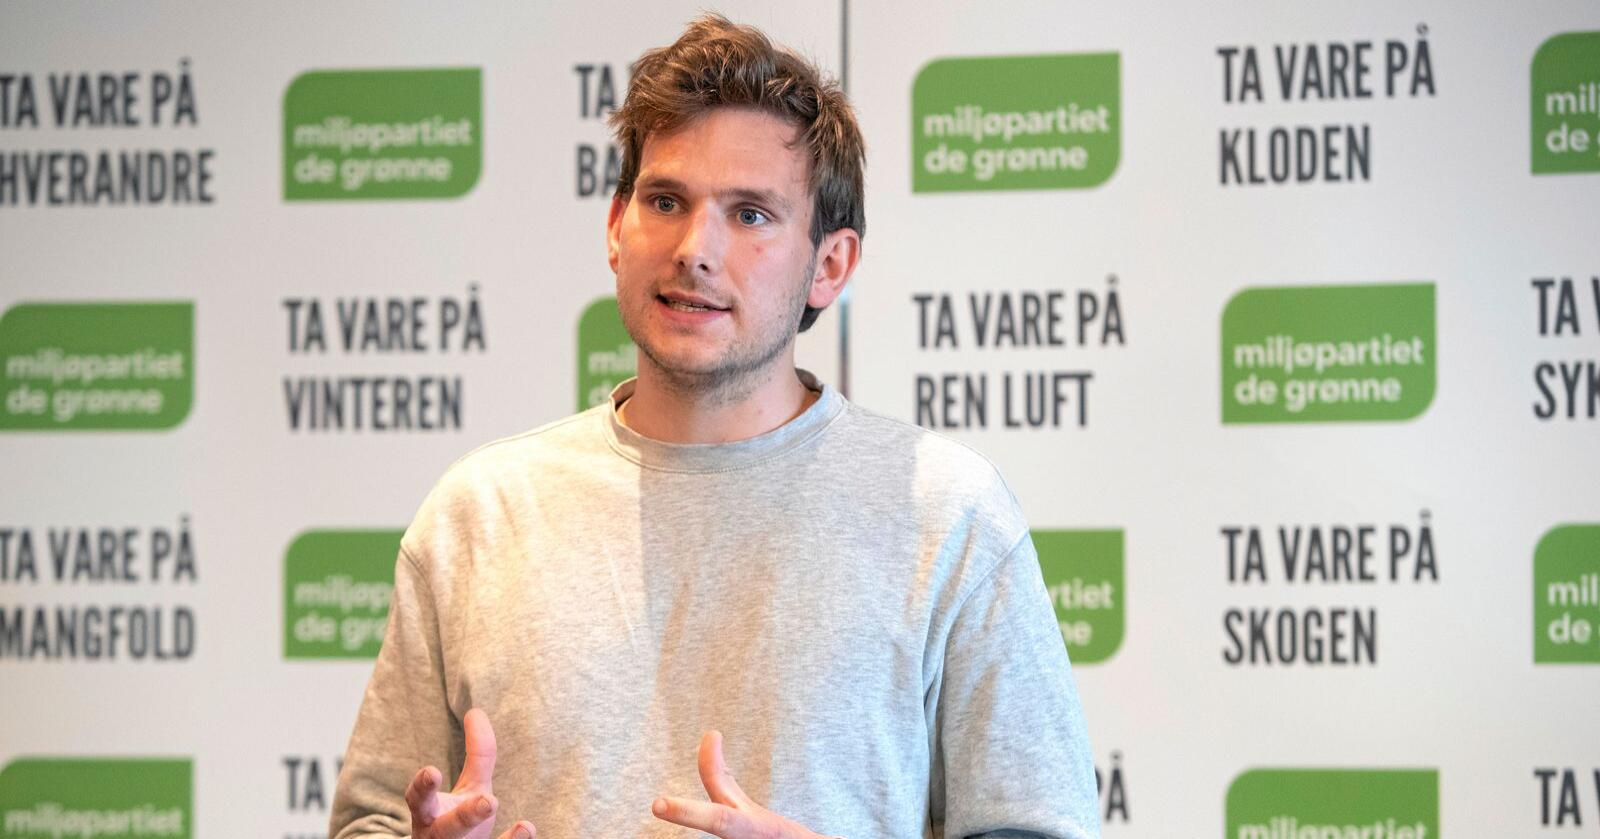 Talsperson Teodor Bruu i Grønn Ungdom vil søke på stilling som direktør i Norsk Olje og Gass. Foto: Ryan Kelly / NTB scanpix